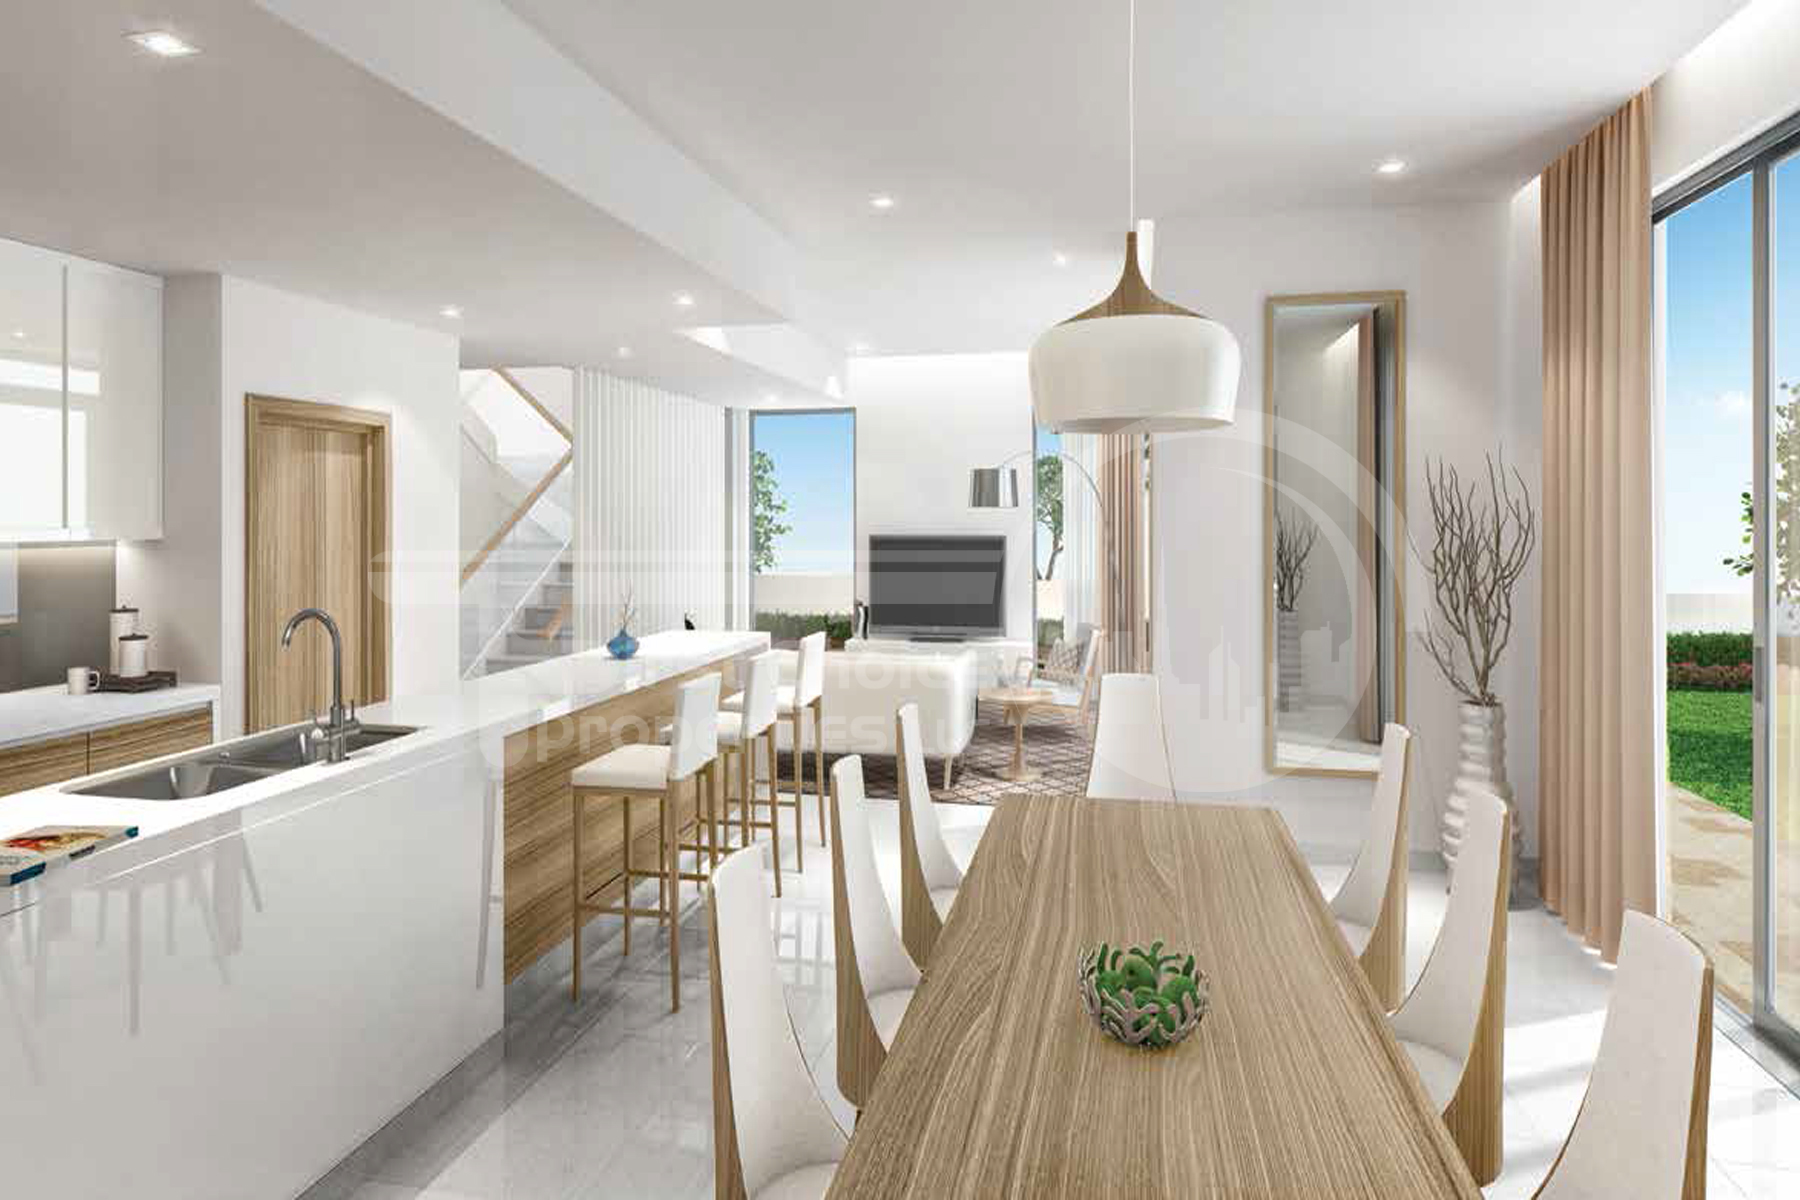 2 Bedroom - 3 Bedroom - 4 Bedroom - 5 Bedroom  Villa - Yas Acres - Yas Island - Abu Dhabi - UAE (24).jpg